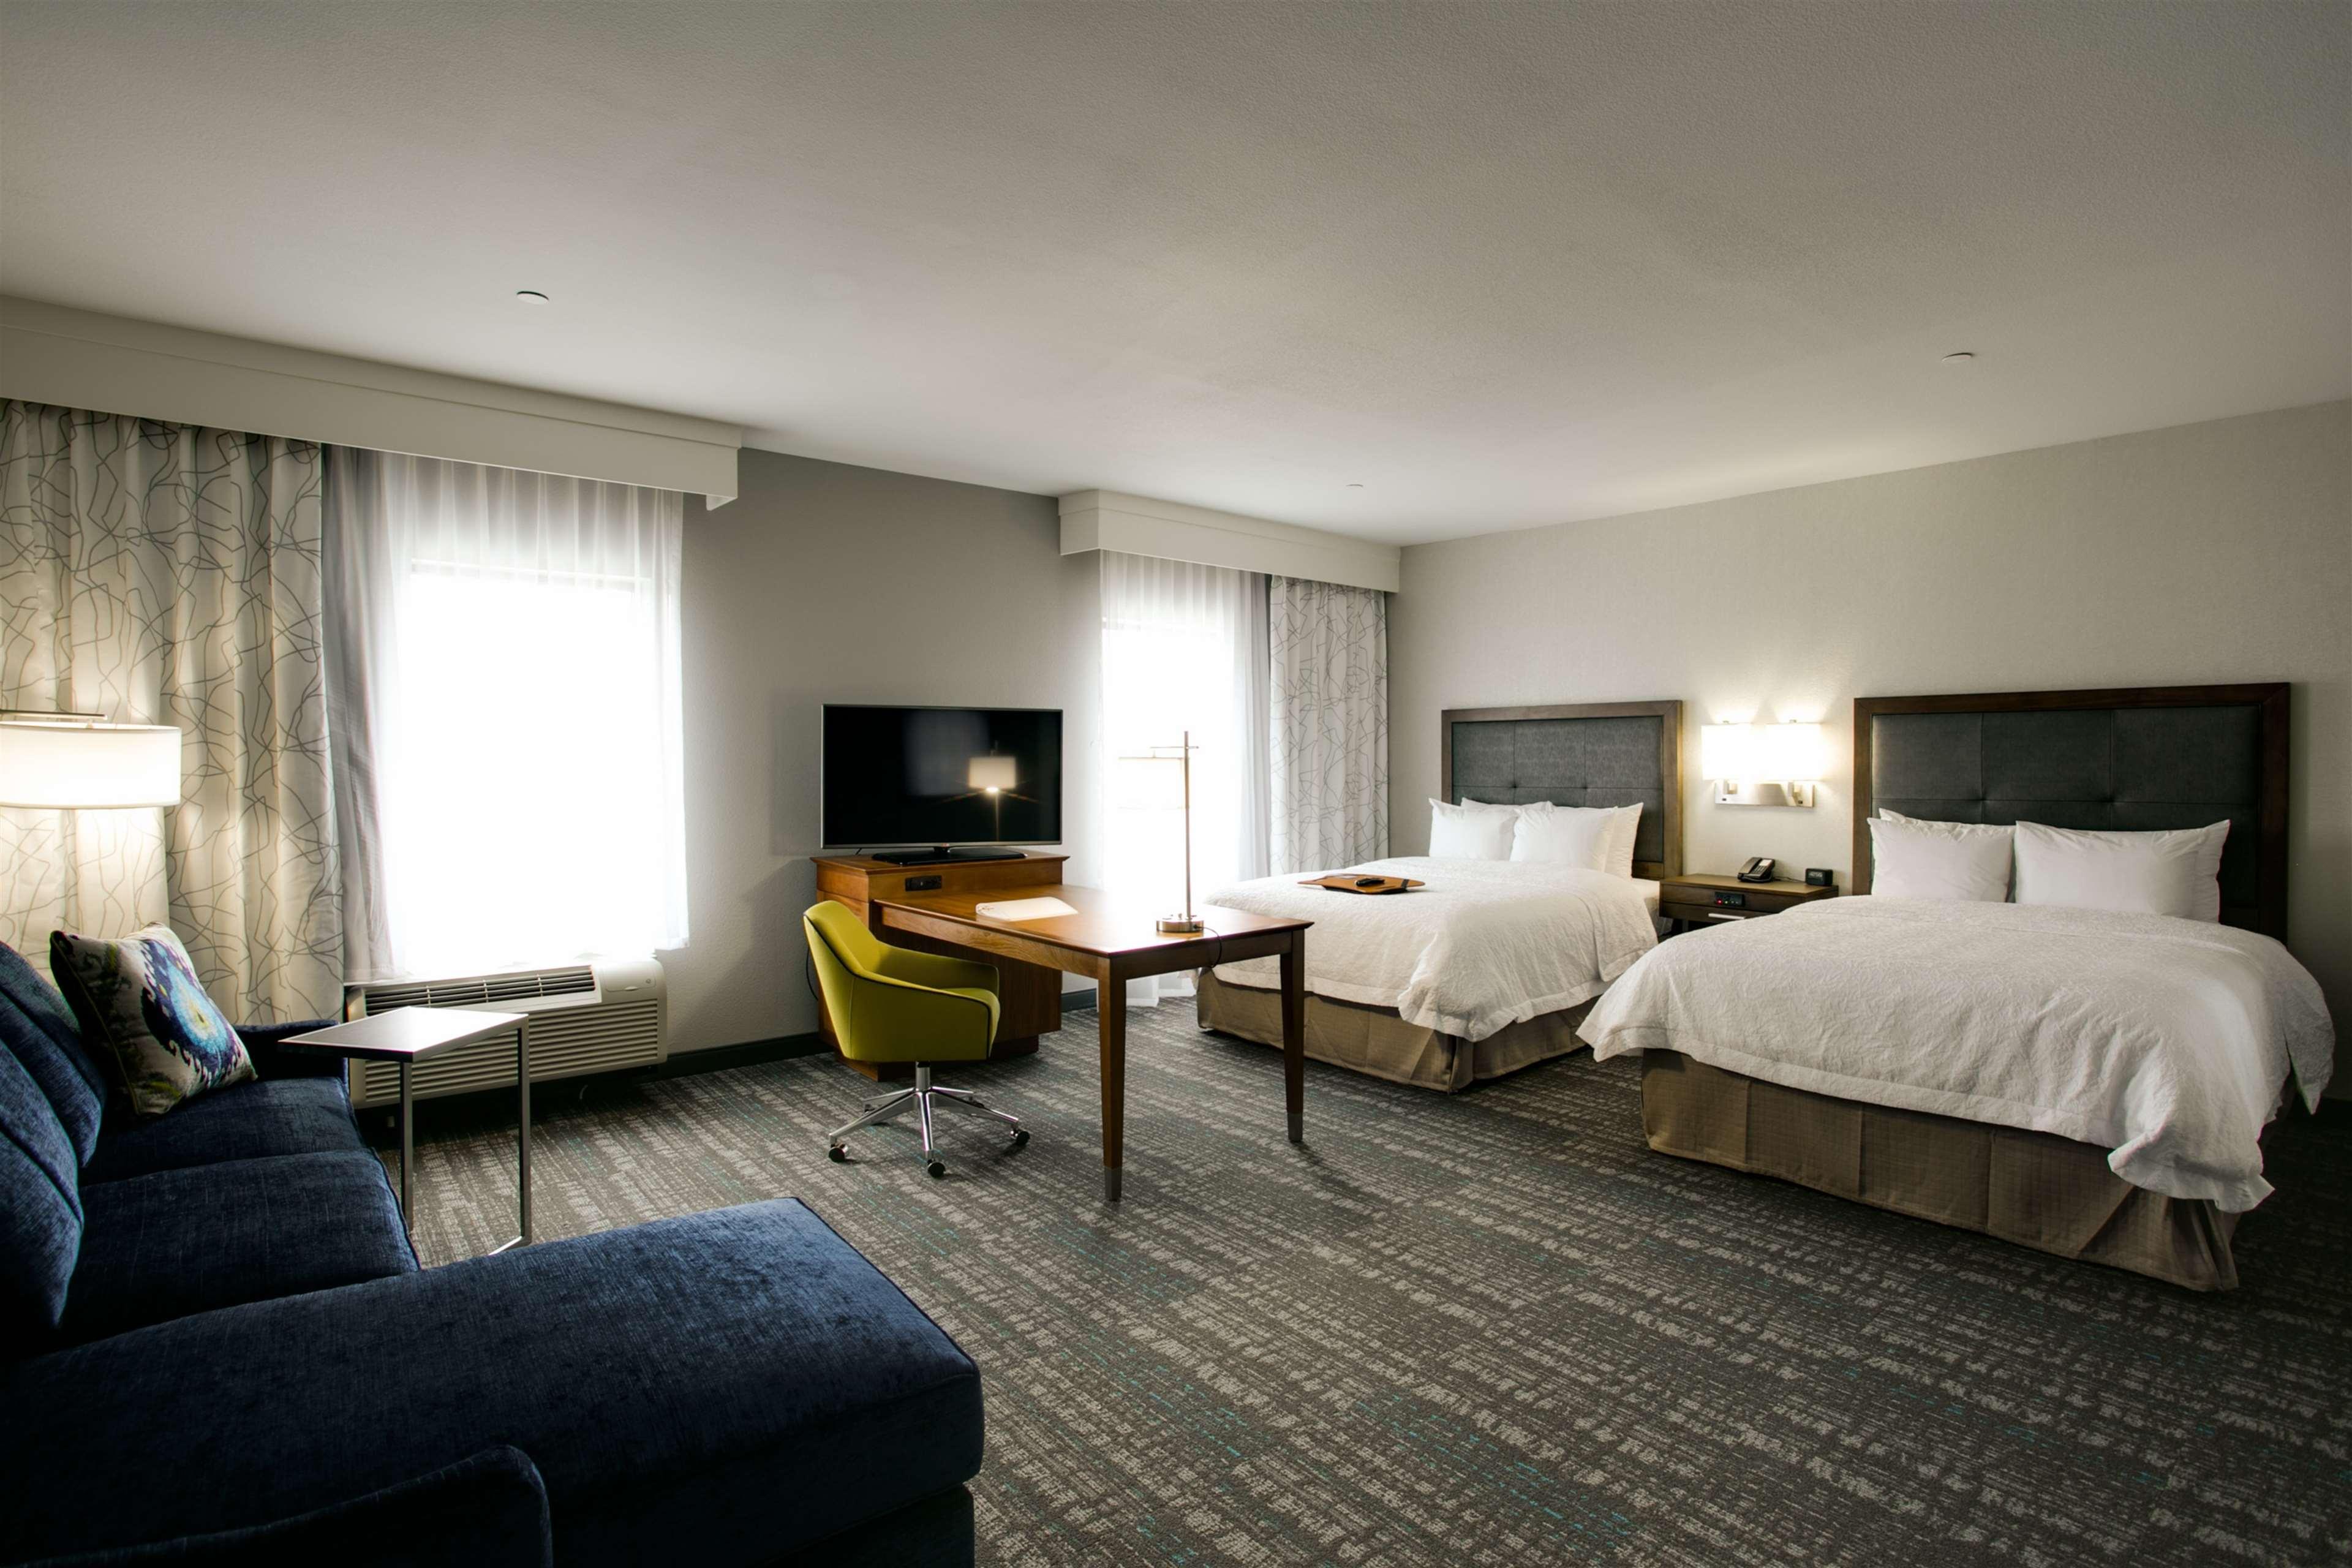 Hampton Inn & Suites Dallas/Ft. Worth Airport South image 25